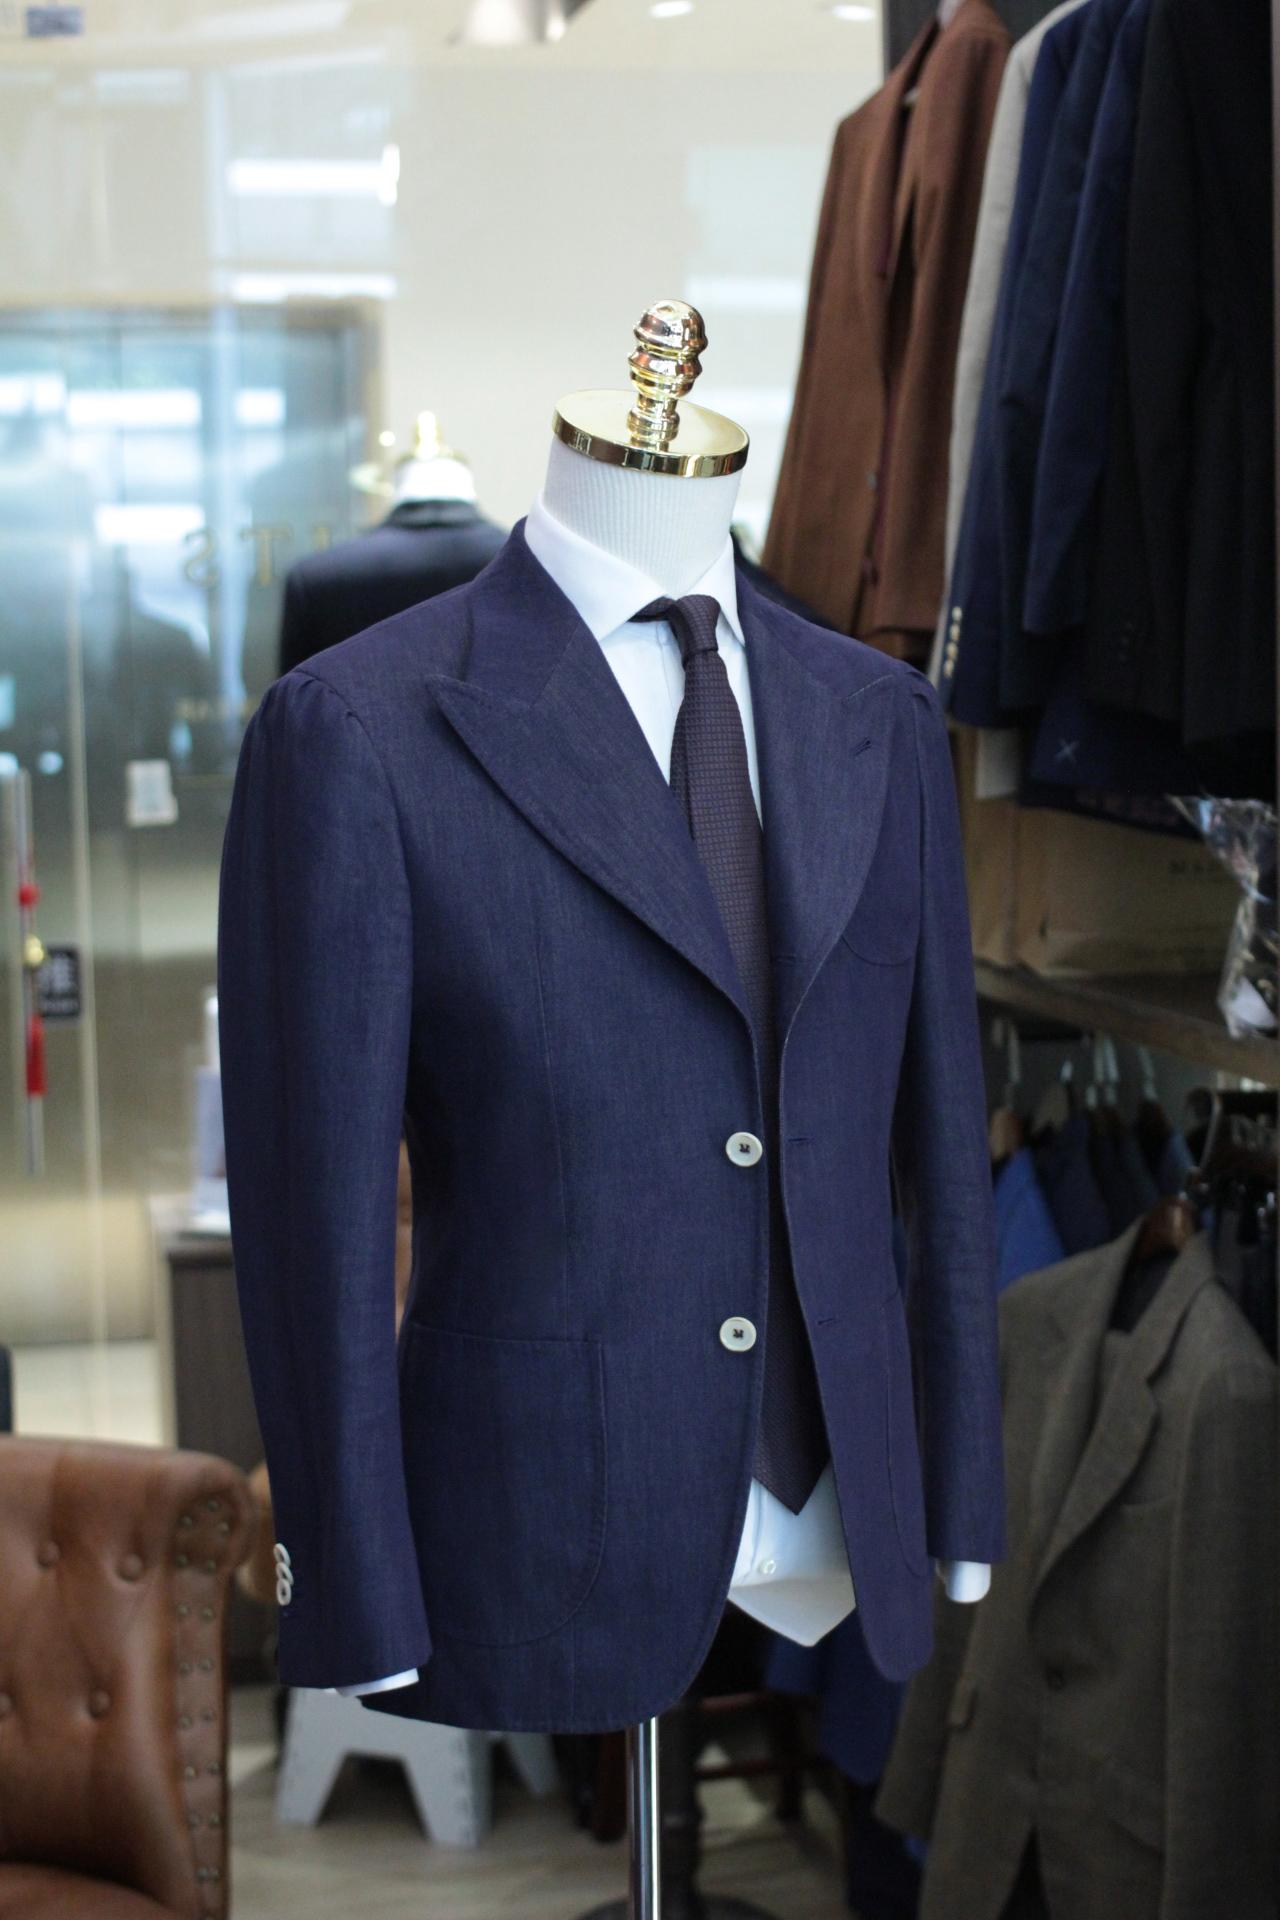 Taylord   Soktas   Denim Suit   Made Suits Singapore   Bespoke Denim Blazer Suits Side Soktas Singapore.JPG